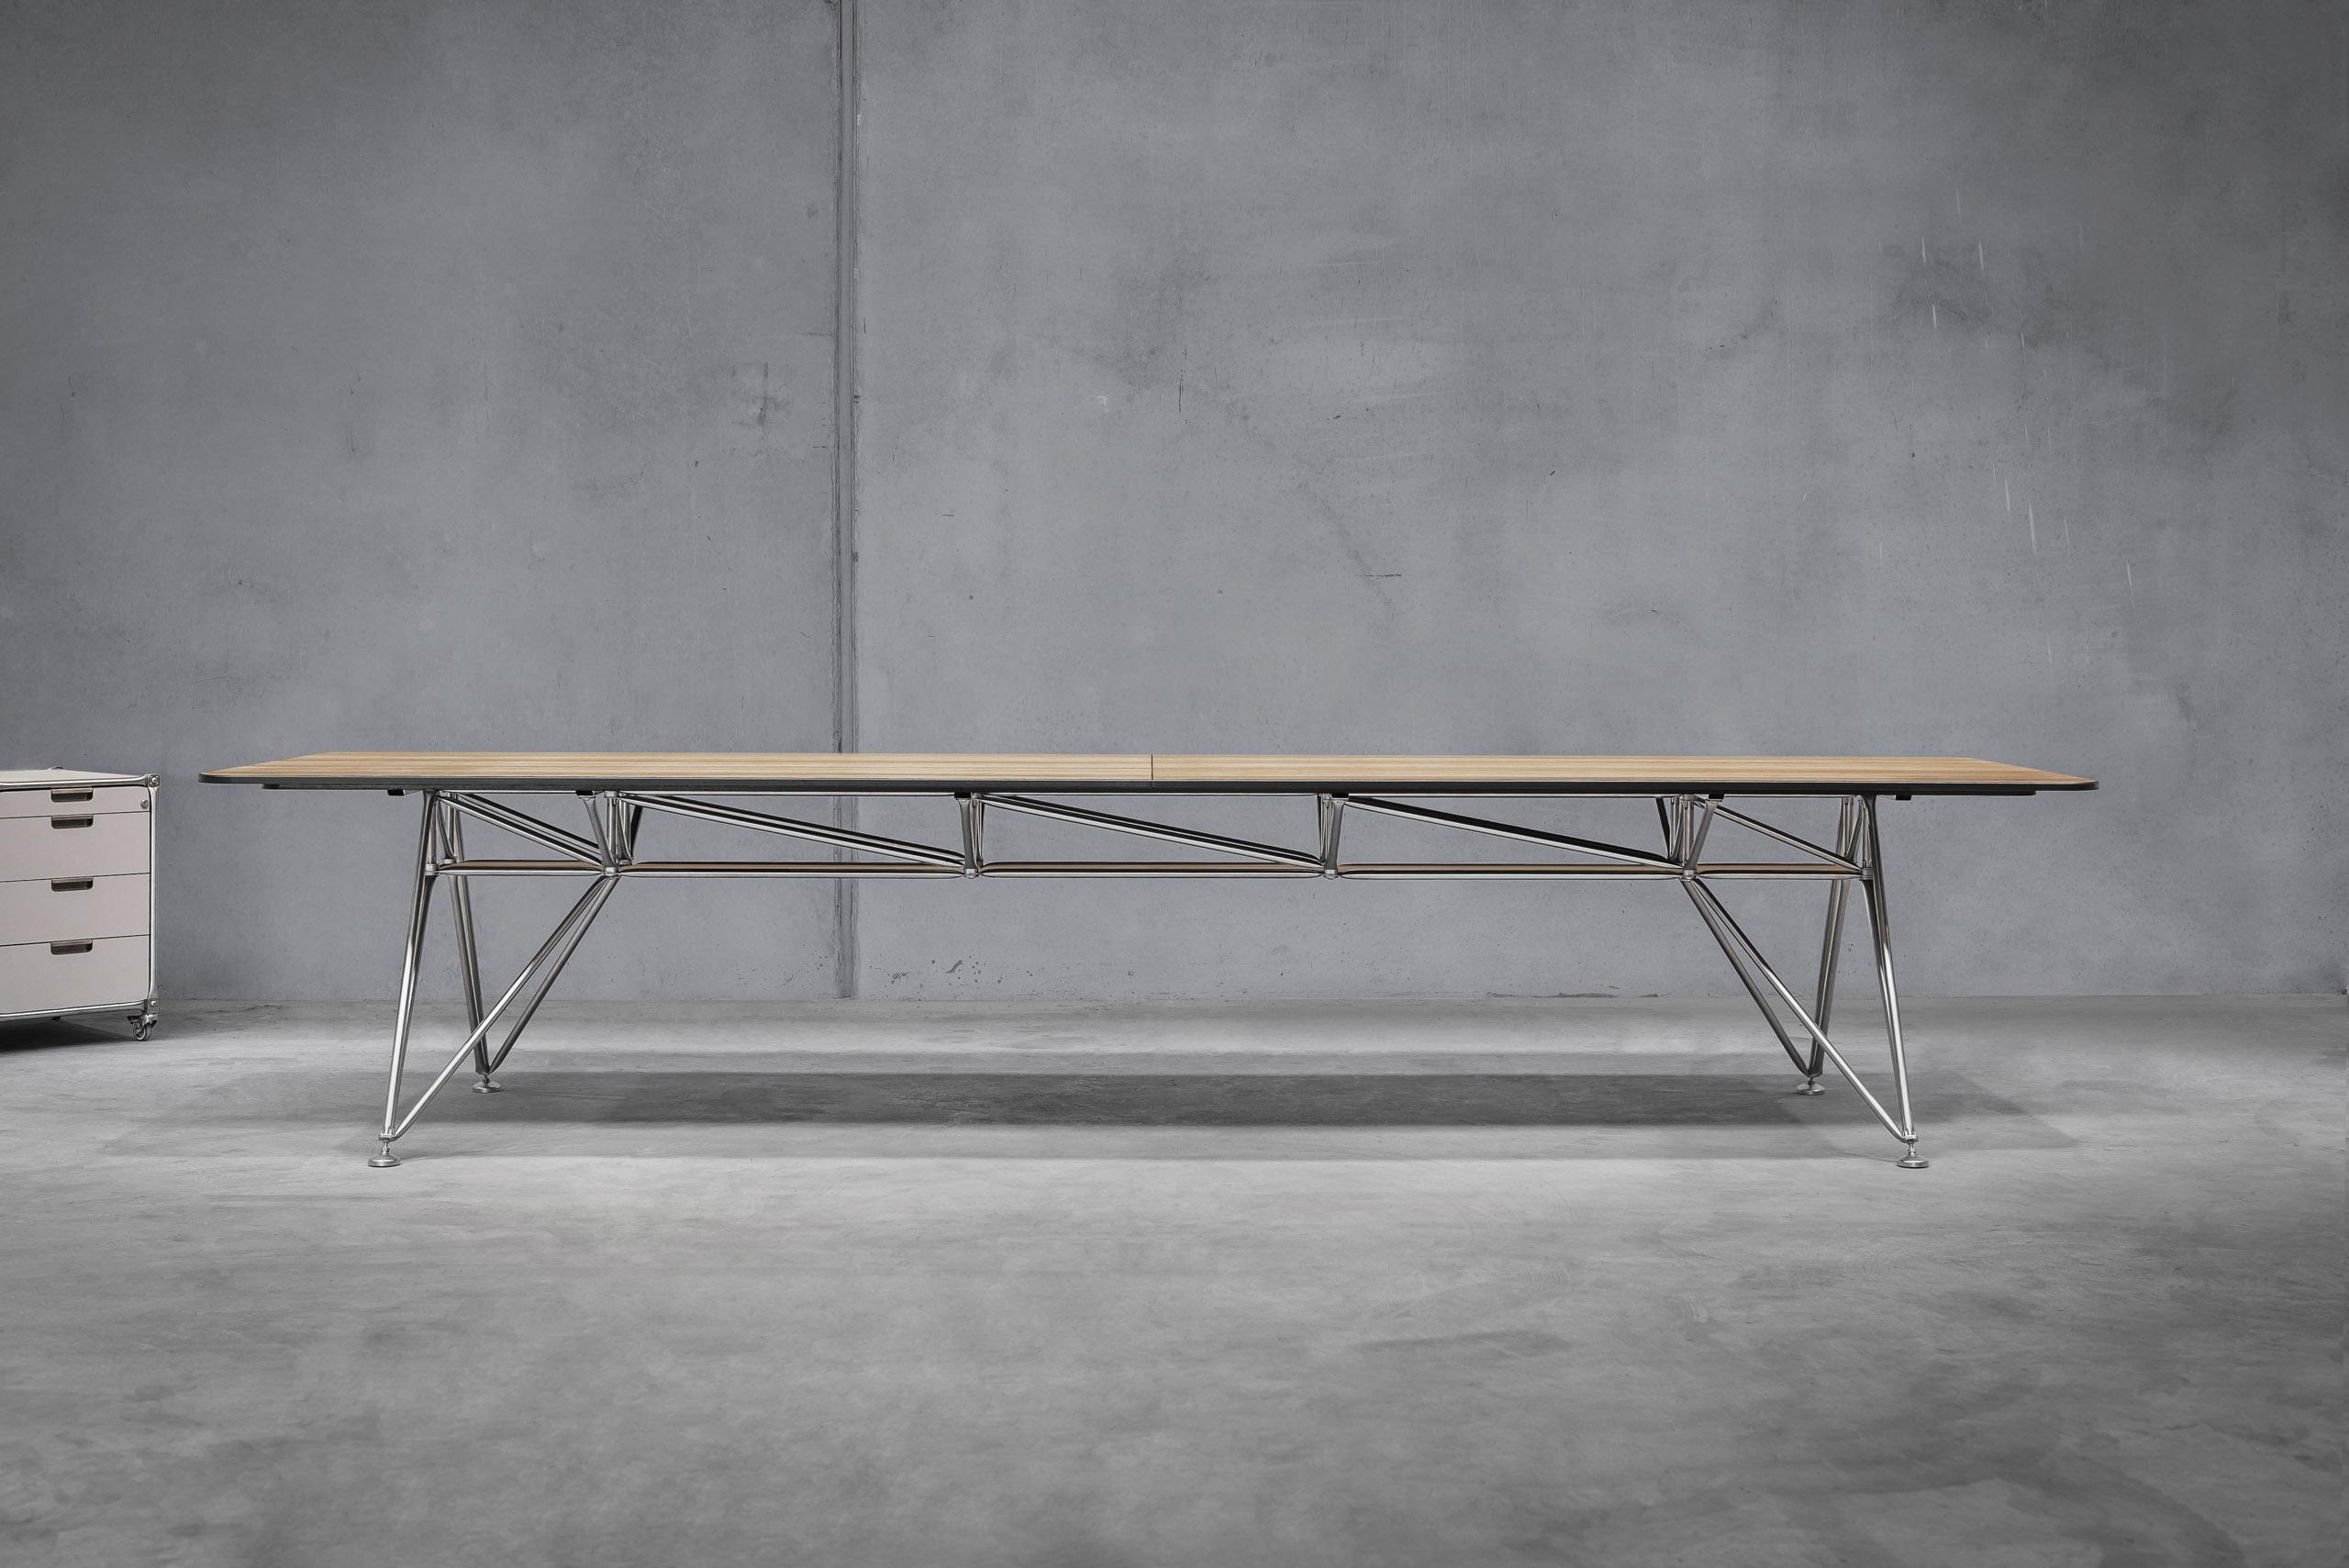 images k series system 180 modulare einrichtung aus berlin. Black Bedroom Furniture Sets. Home Design Ideas